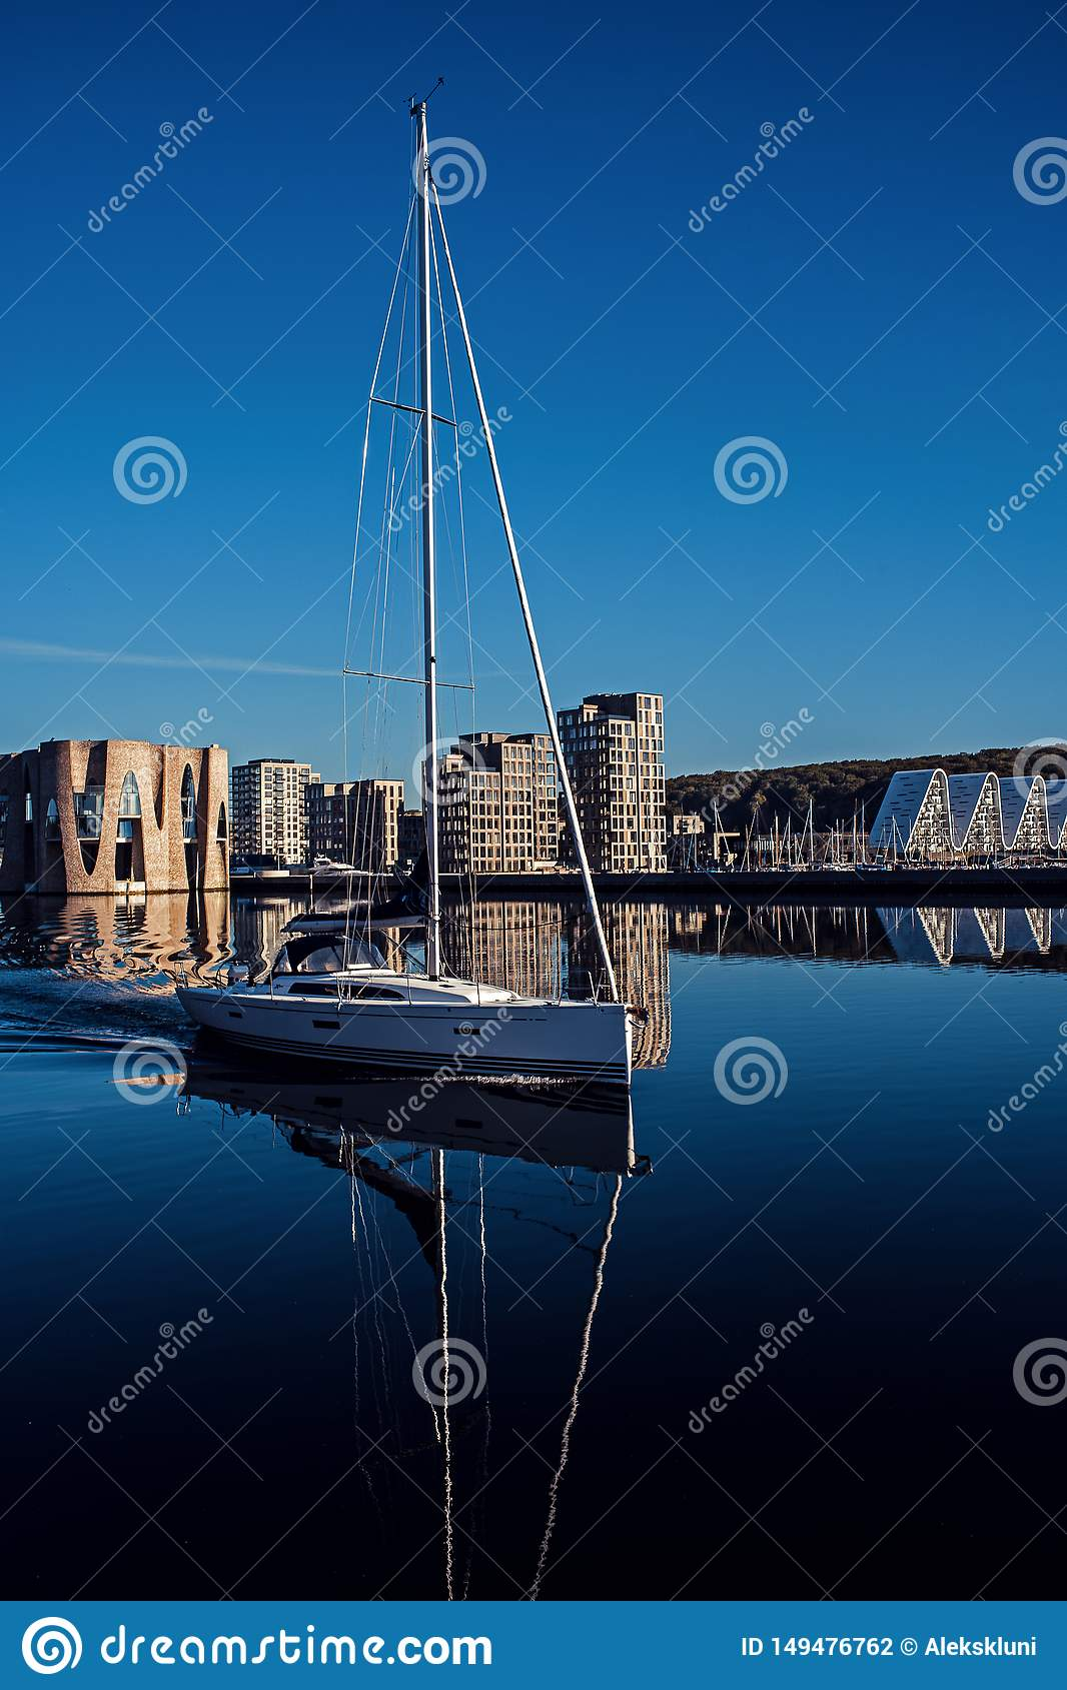 Trevlig vit segla yacht Landskap av byggnader n?ra pir Yacht p? bakgrunden av nybyggen